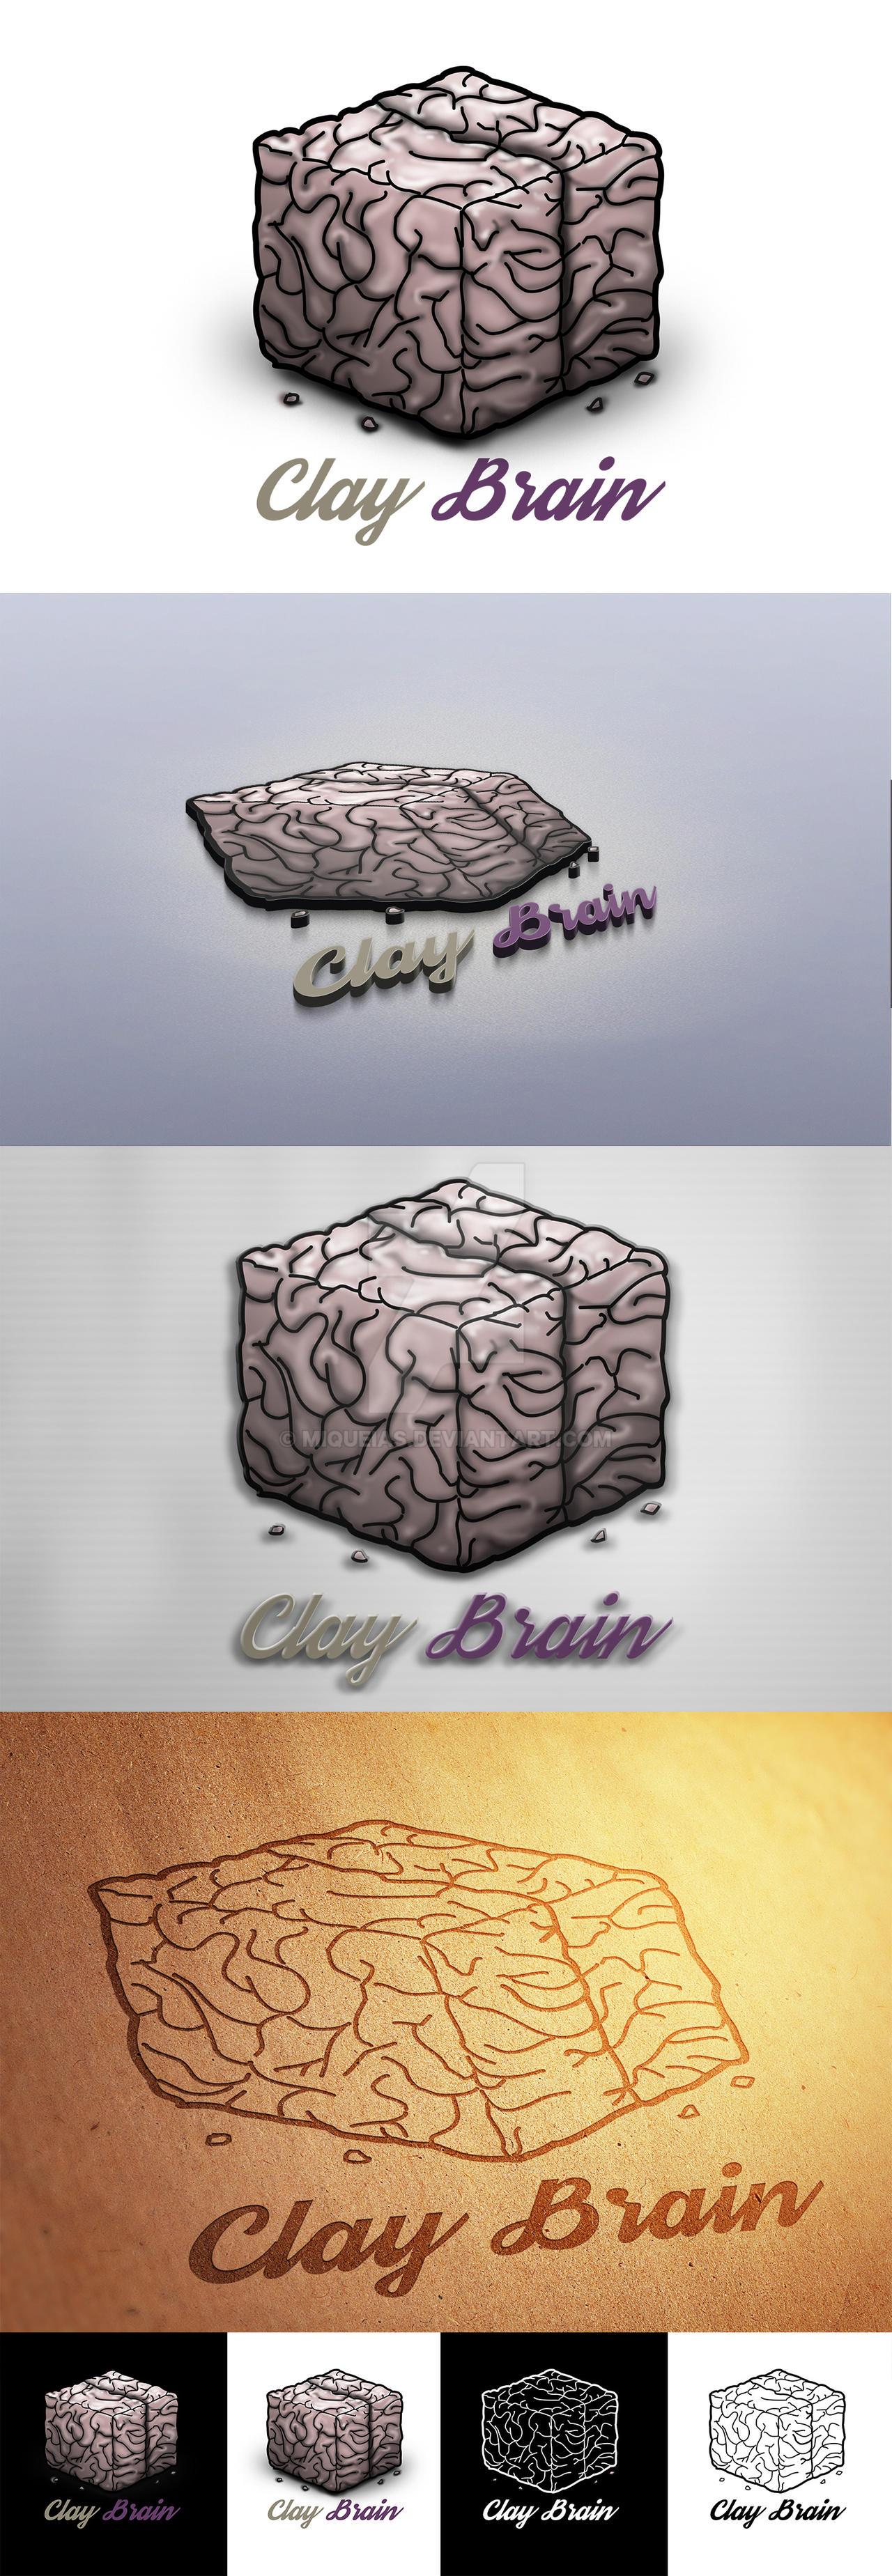 ClayBrain by miqueias